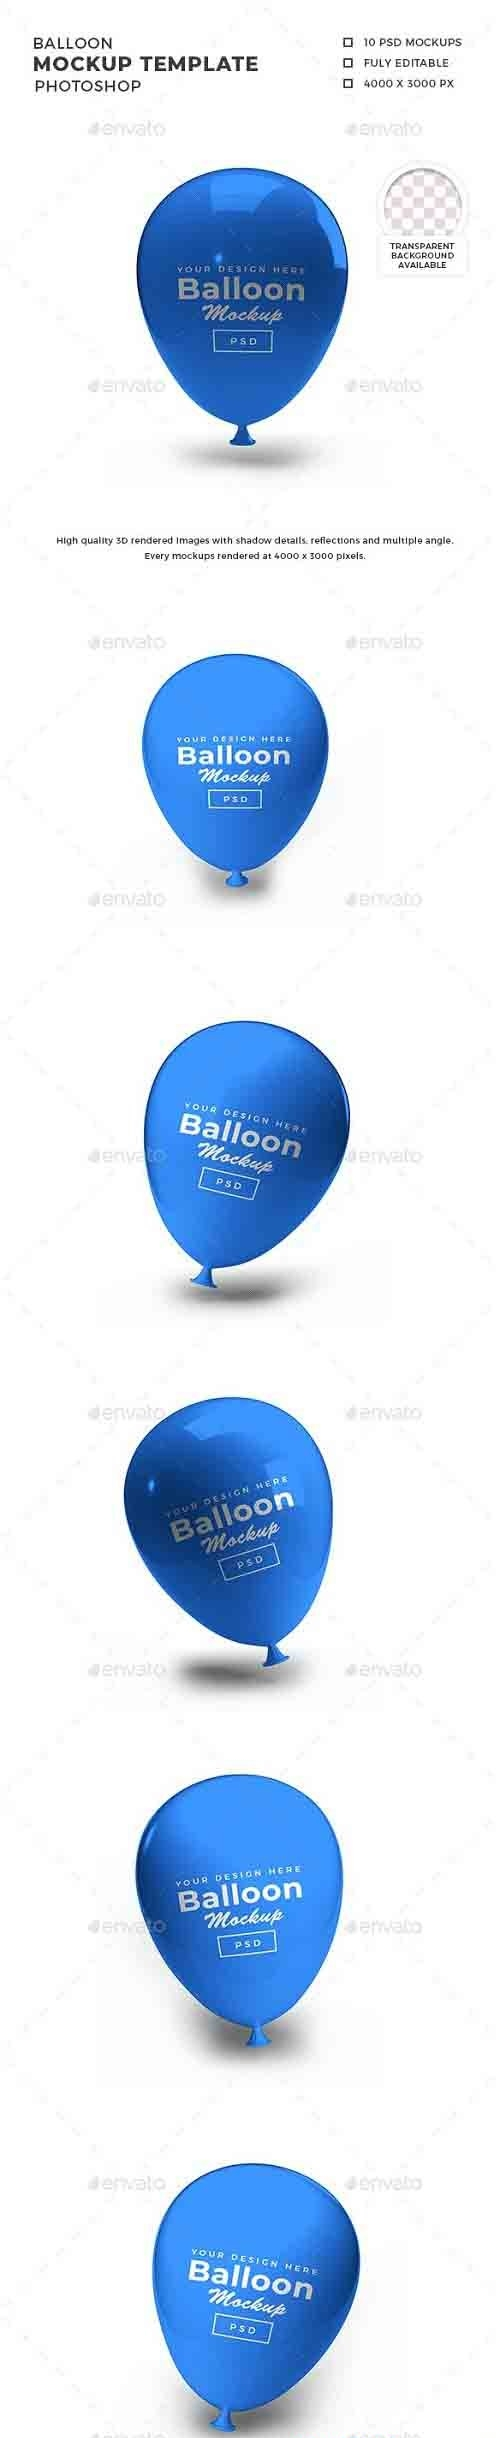 Balloon 3D Mockup Template - 30813881